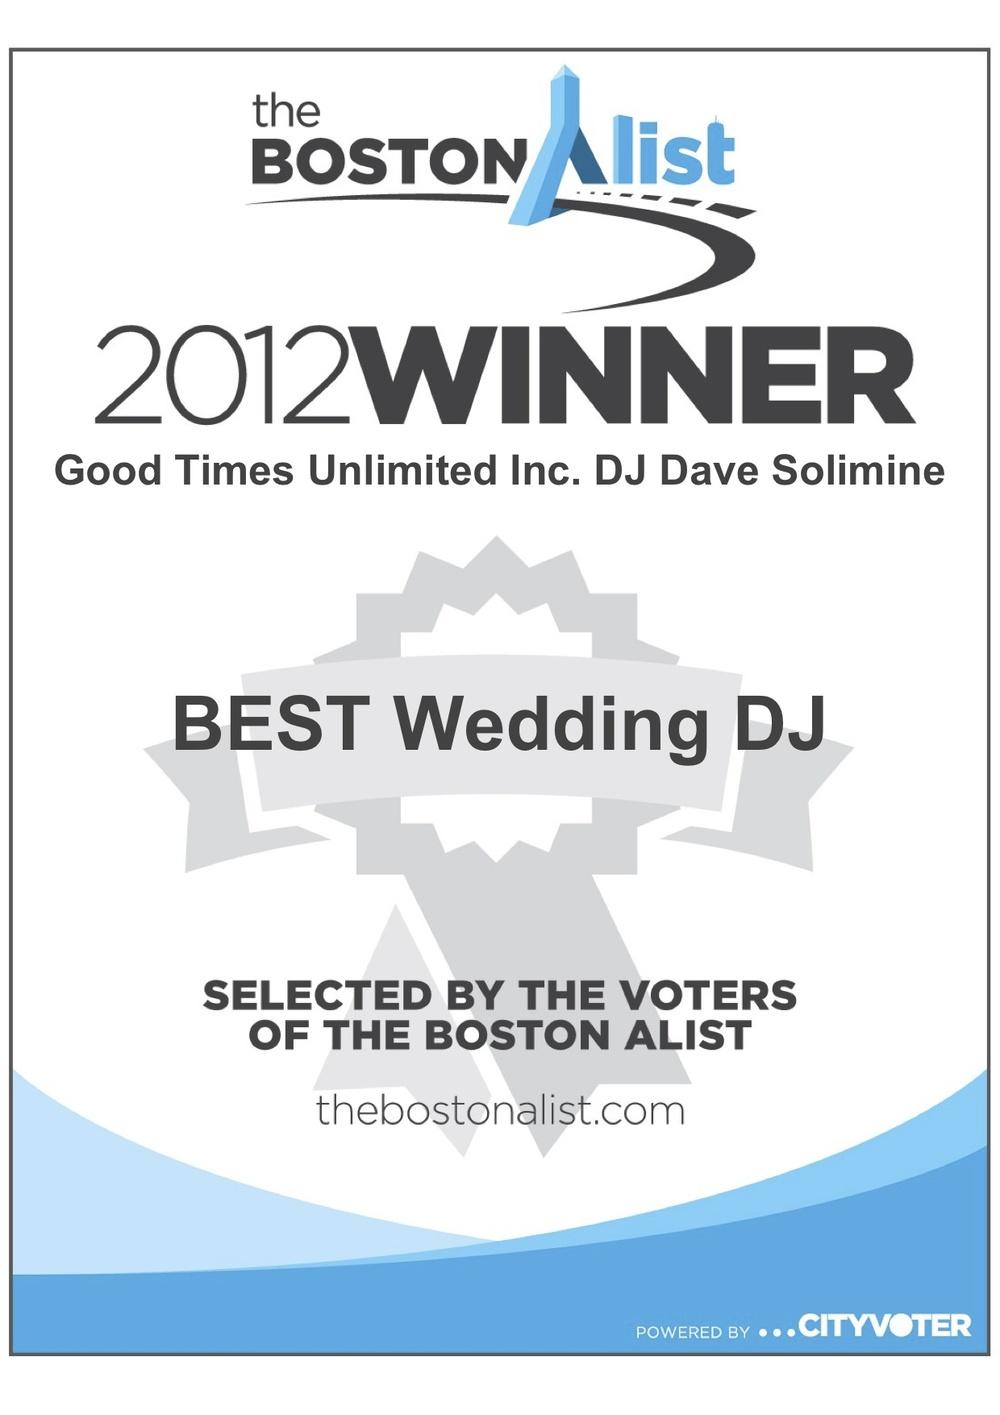 good-times-unlimited-inc-dj-dave-solimine-winners-certificate.jpg